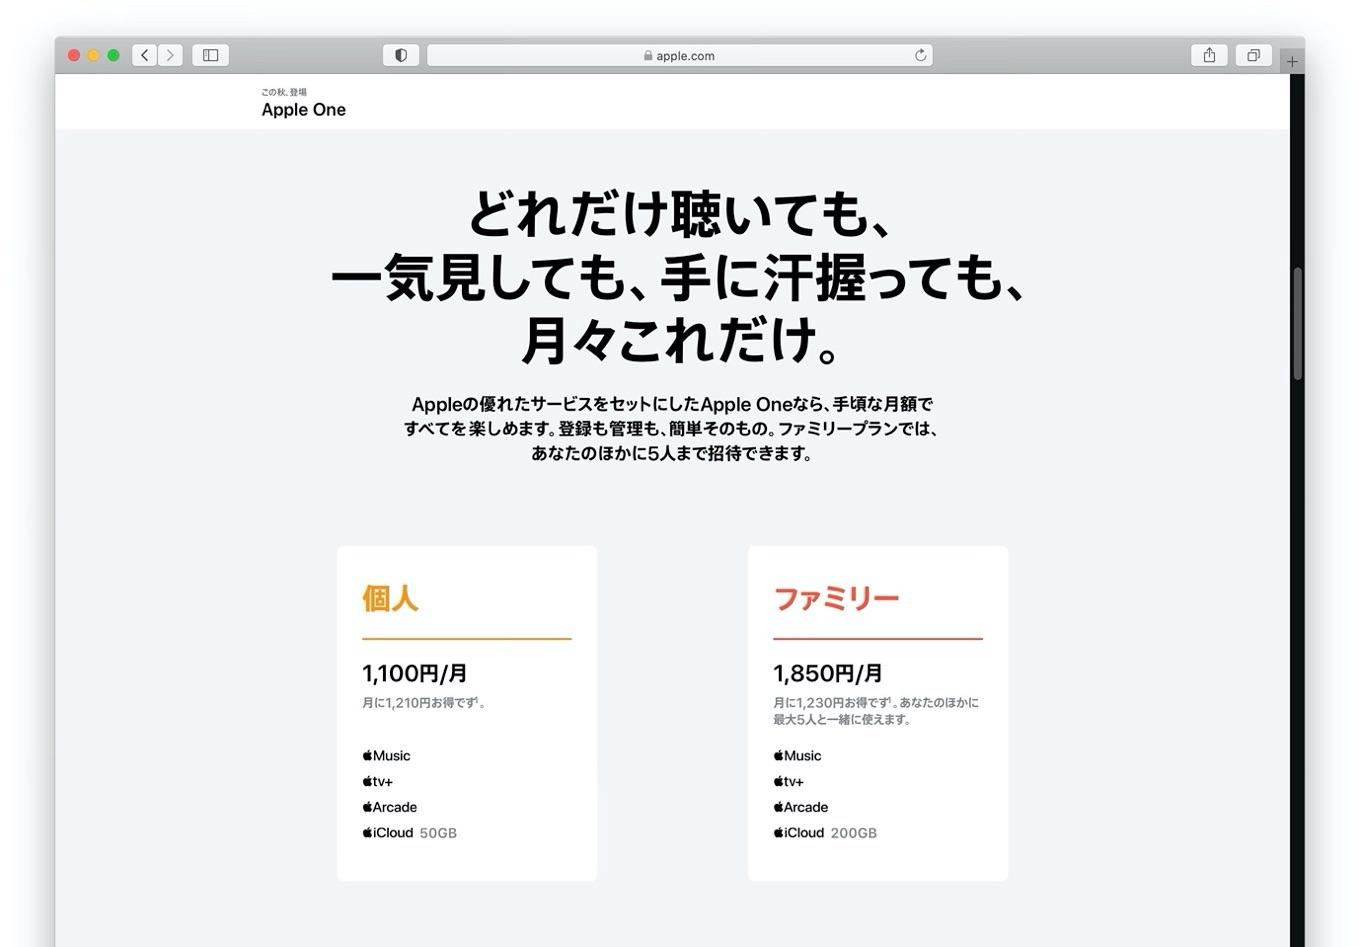 Apple One Japan